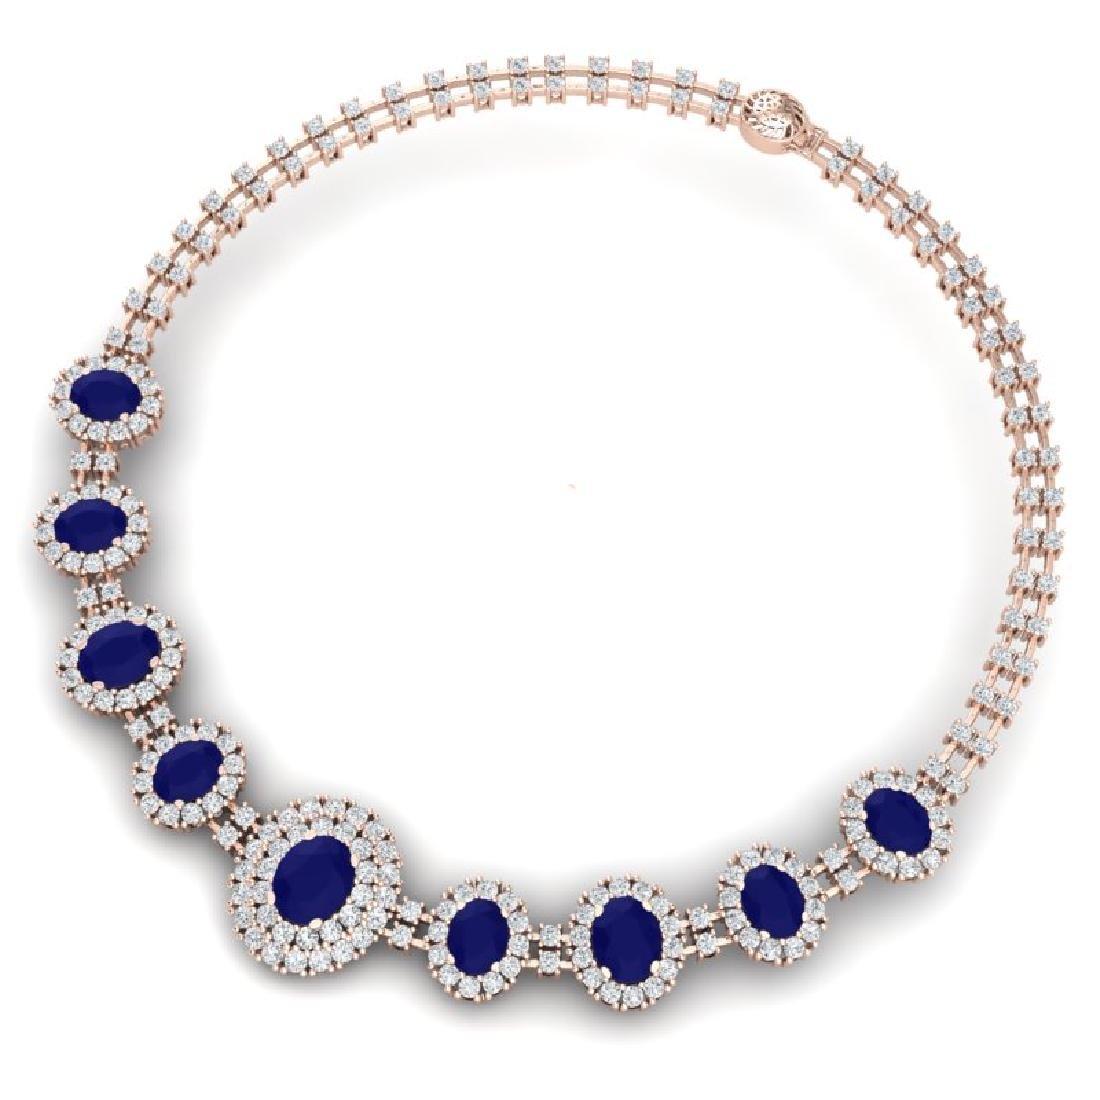 45.69 CTW Royalty Sapphire & VS Diamond Necklace 18K - 3